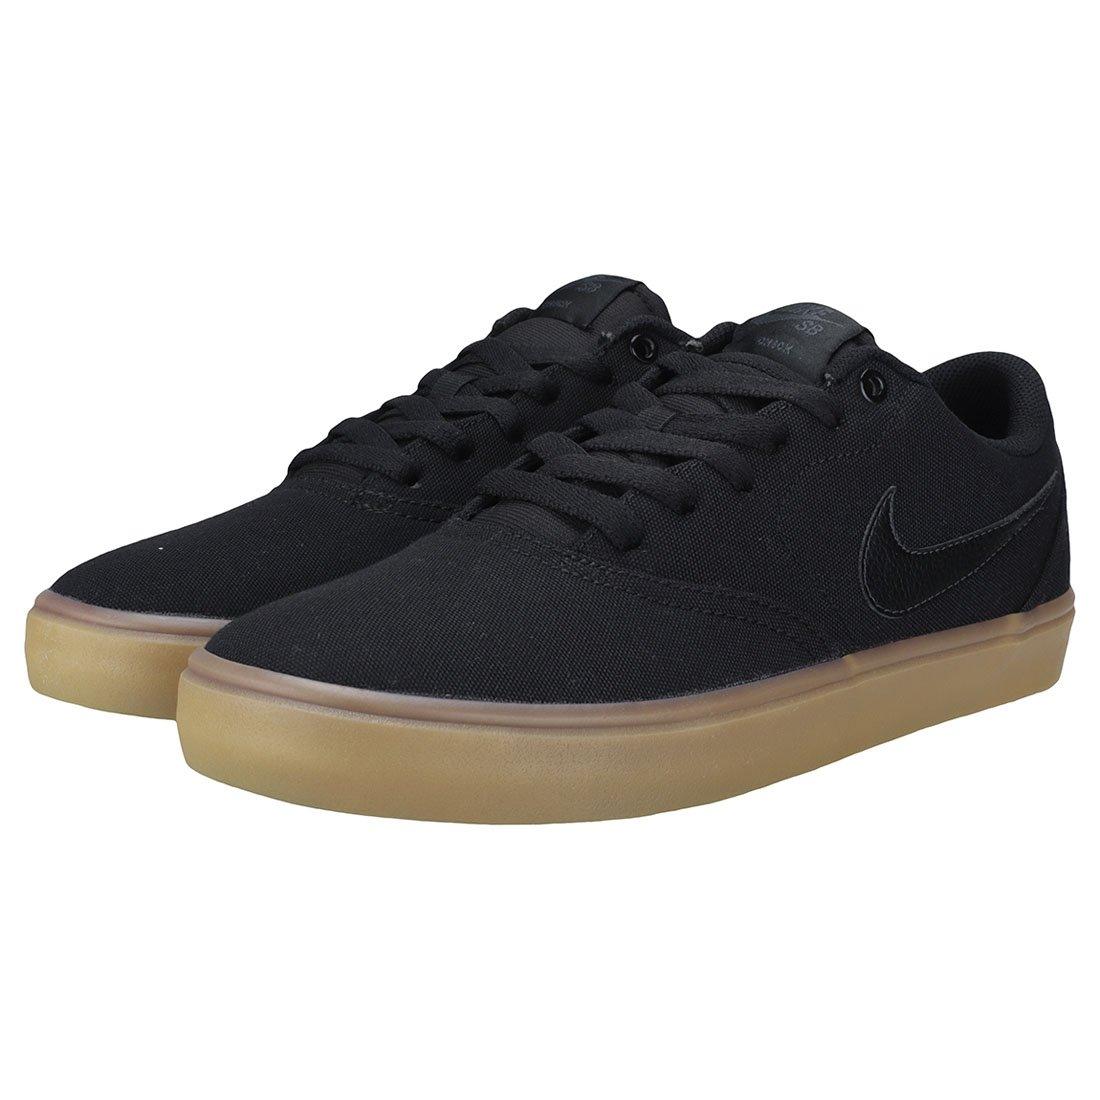 Nike Men's SB Check Solarsoft Canvas Skateboarding Shoes Black/Black-Gum Light Brown 10 by Nike (Image #9)